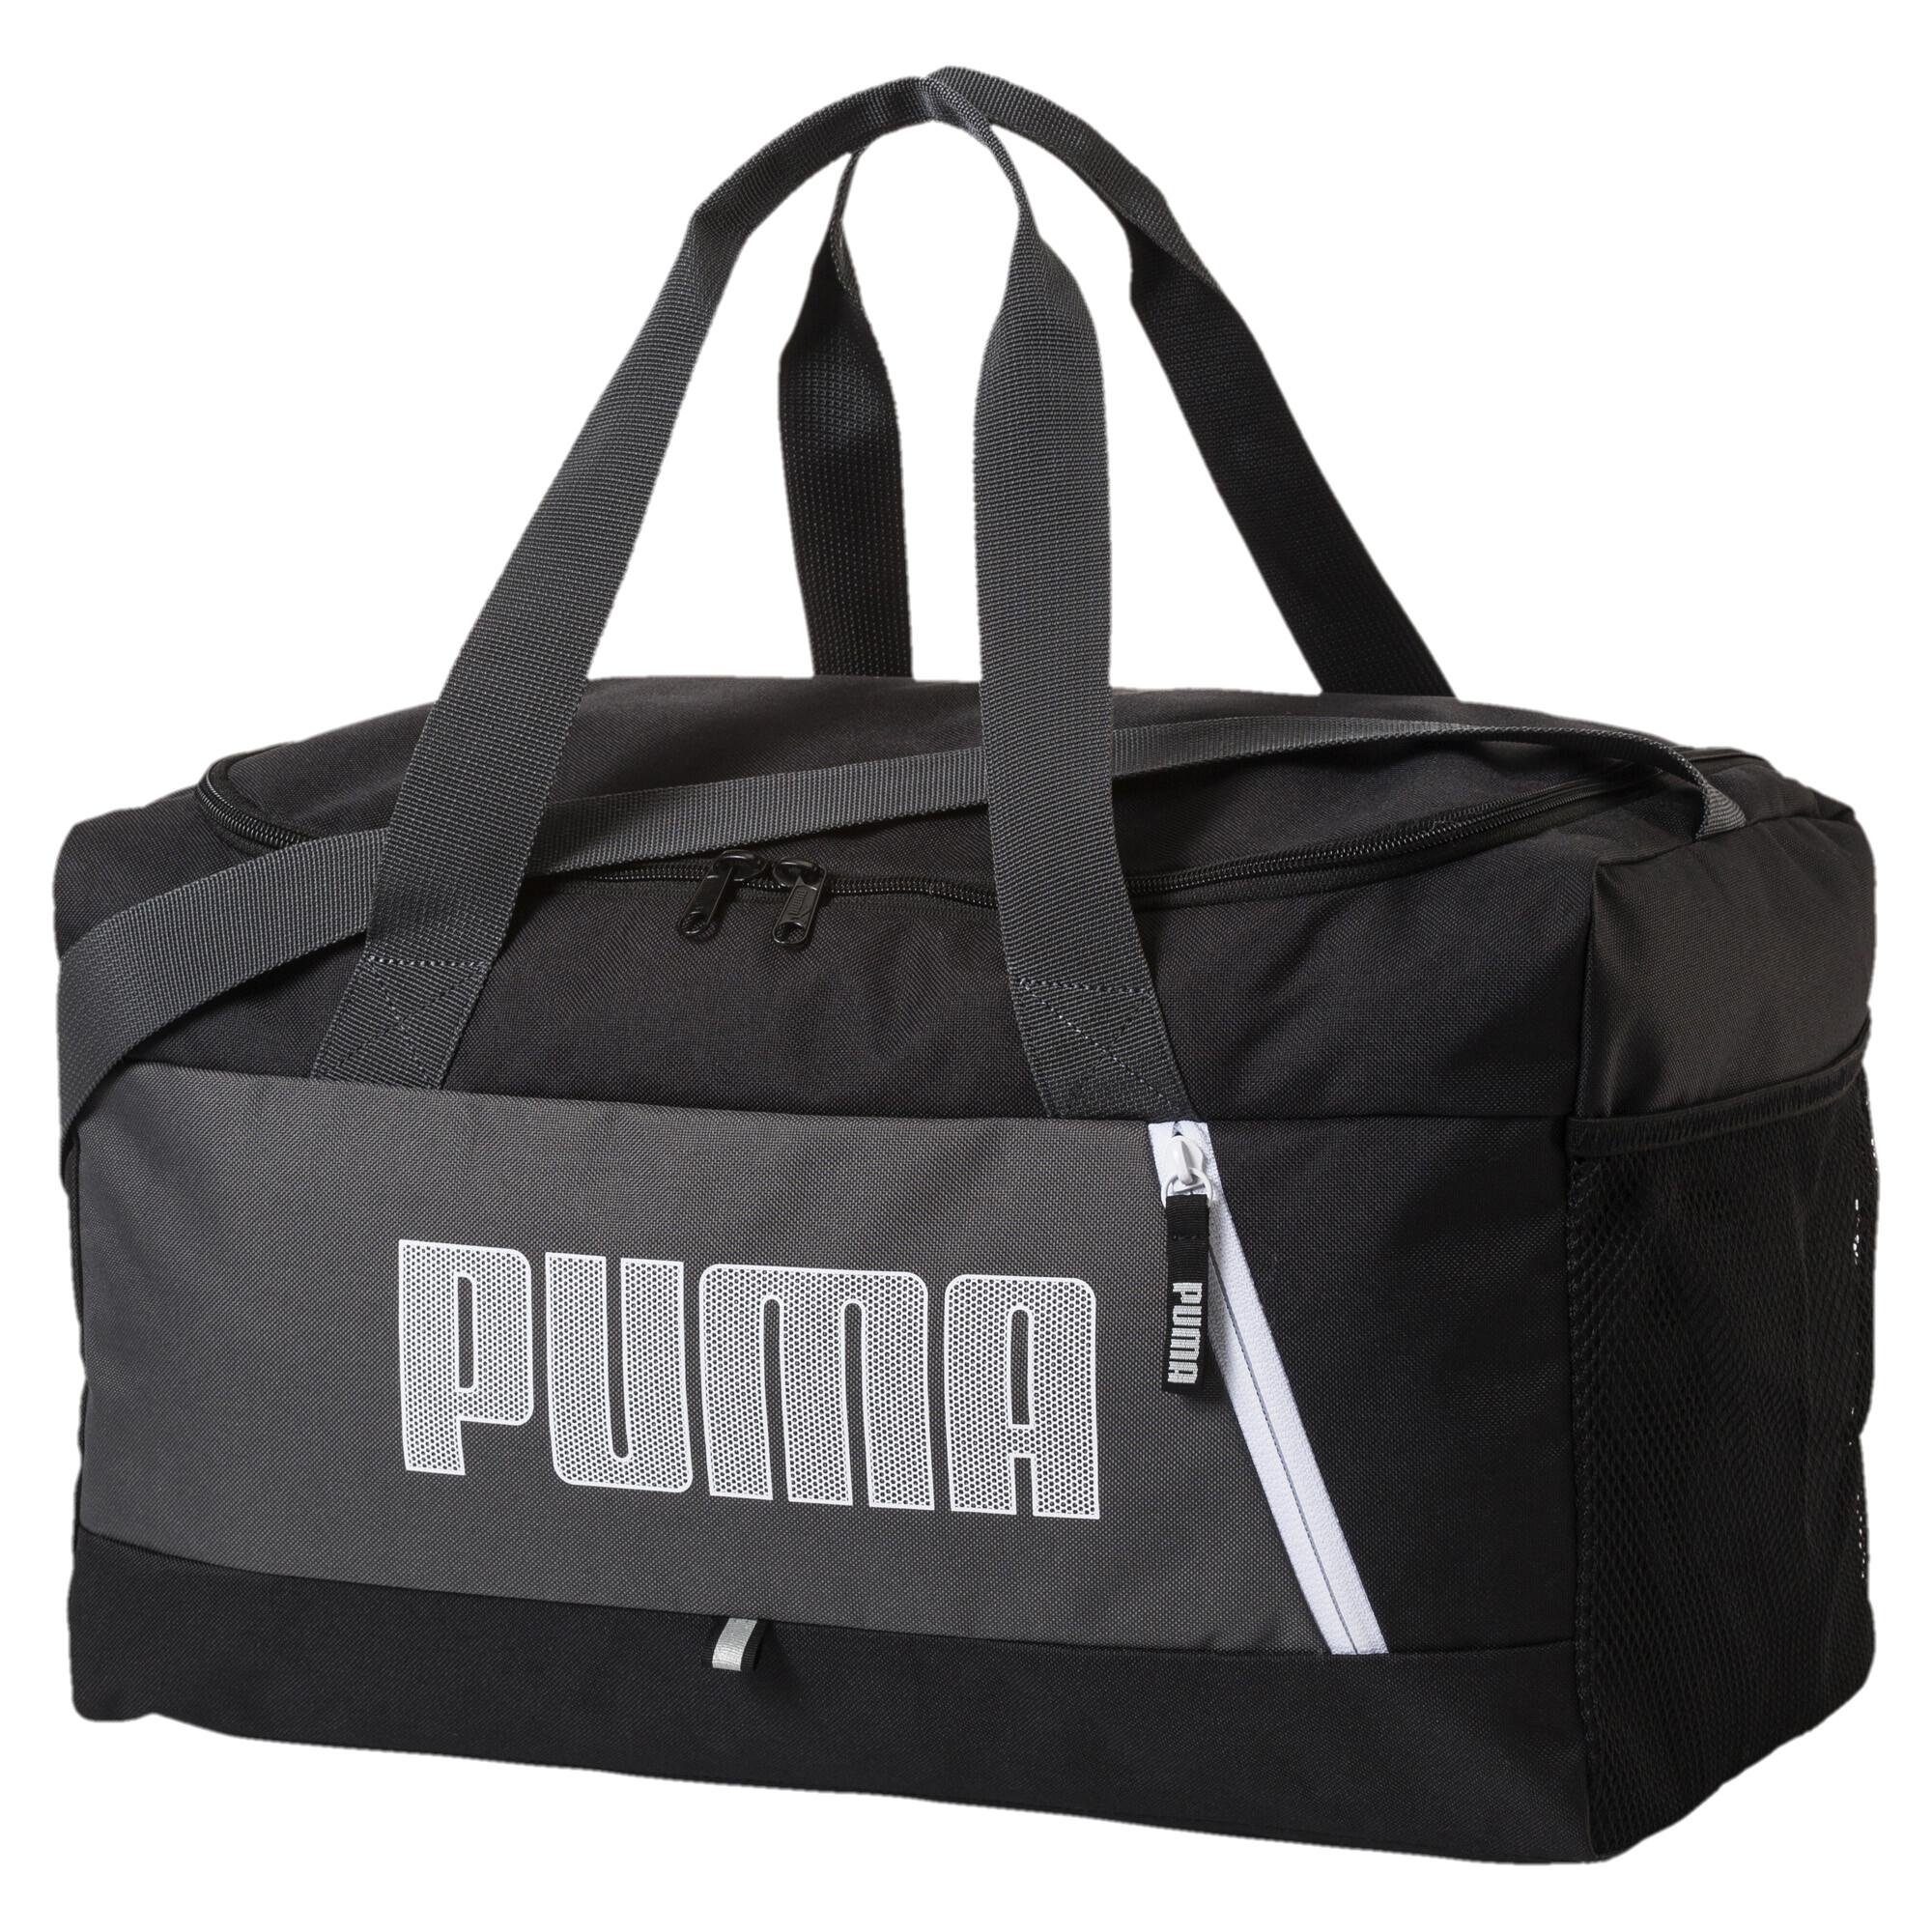 48c06e8253 Fundamentals Sports Bags Small II | 10 - Black | Puma